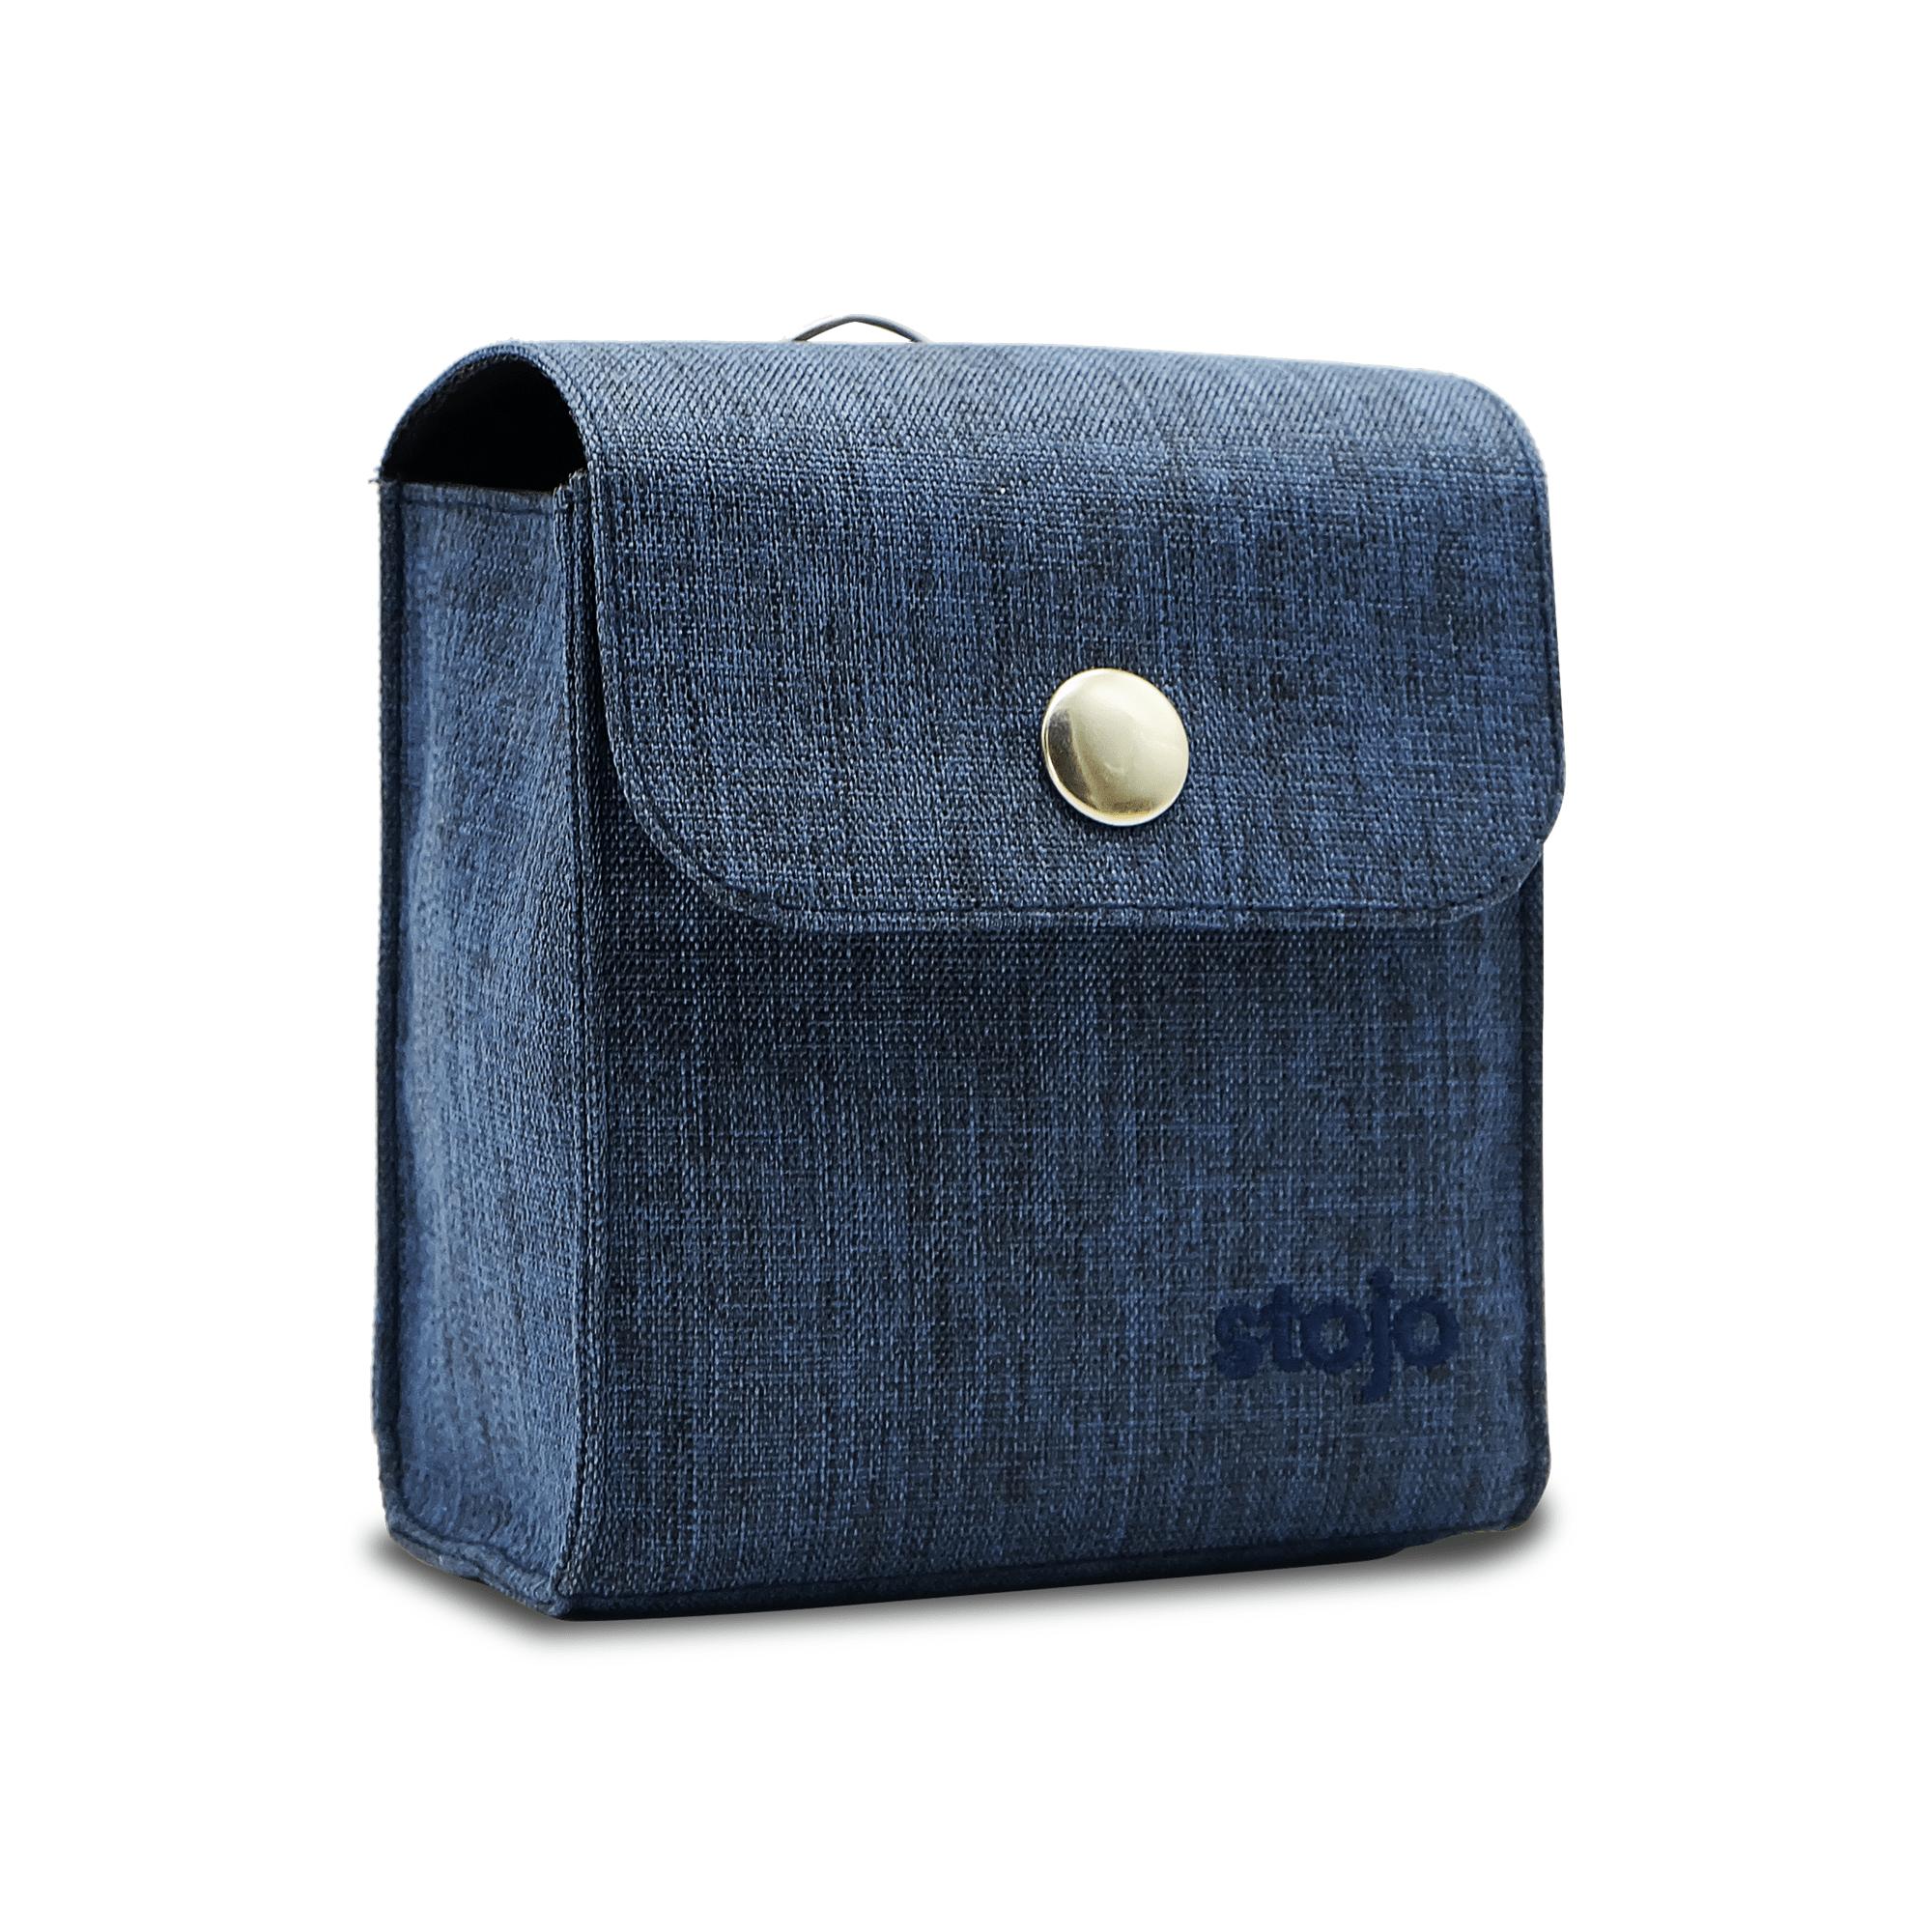 Stojo Compact Pouch - Denim Blue